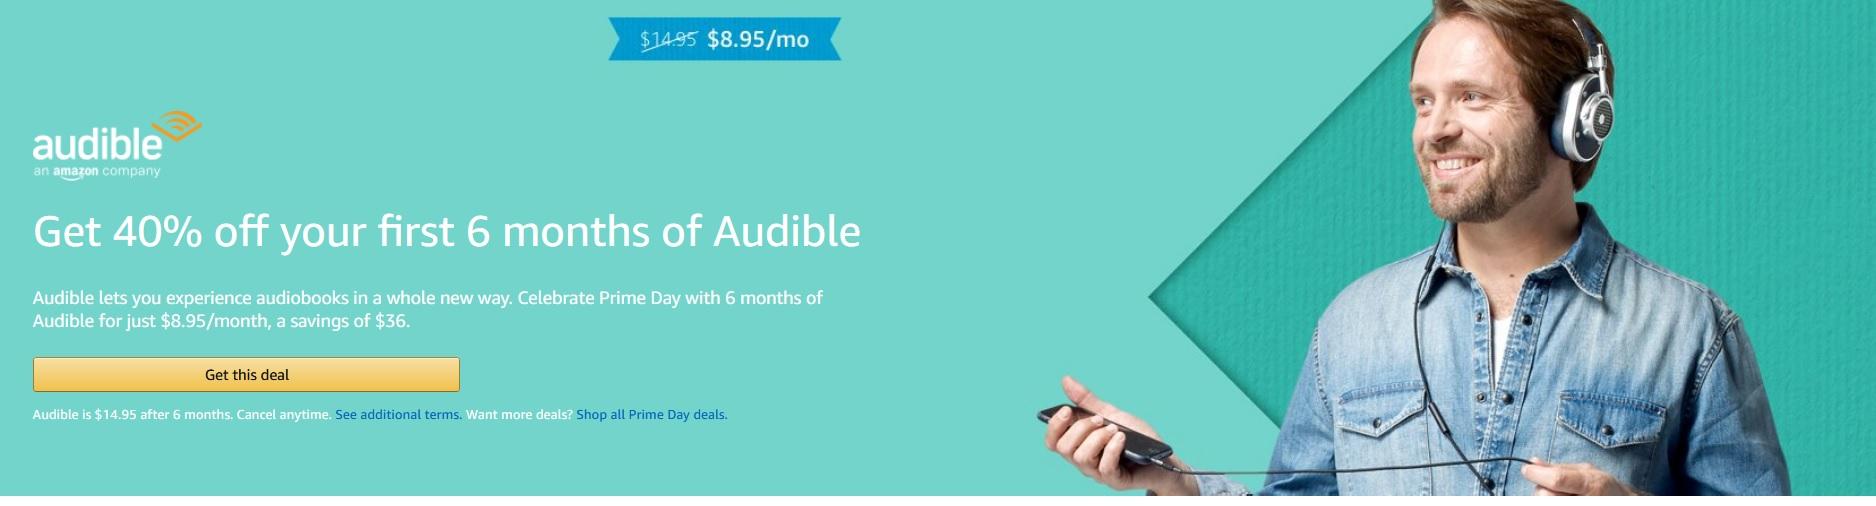 Audible Deal